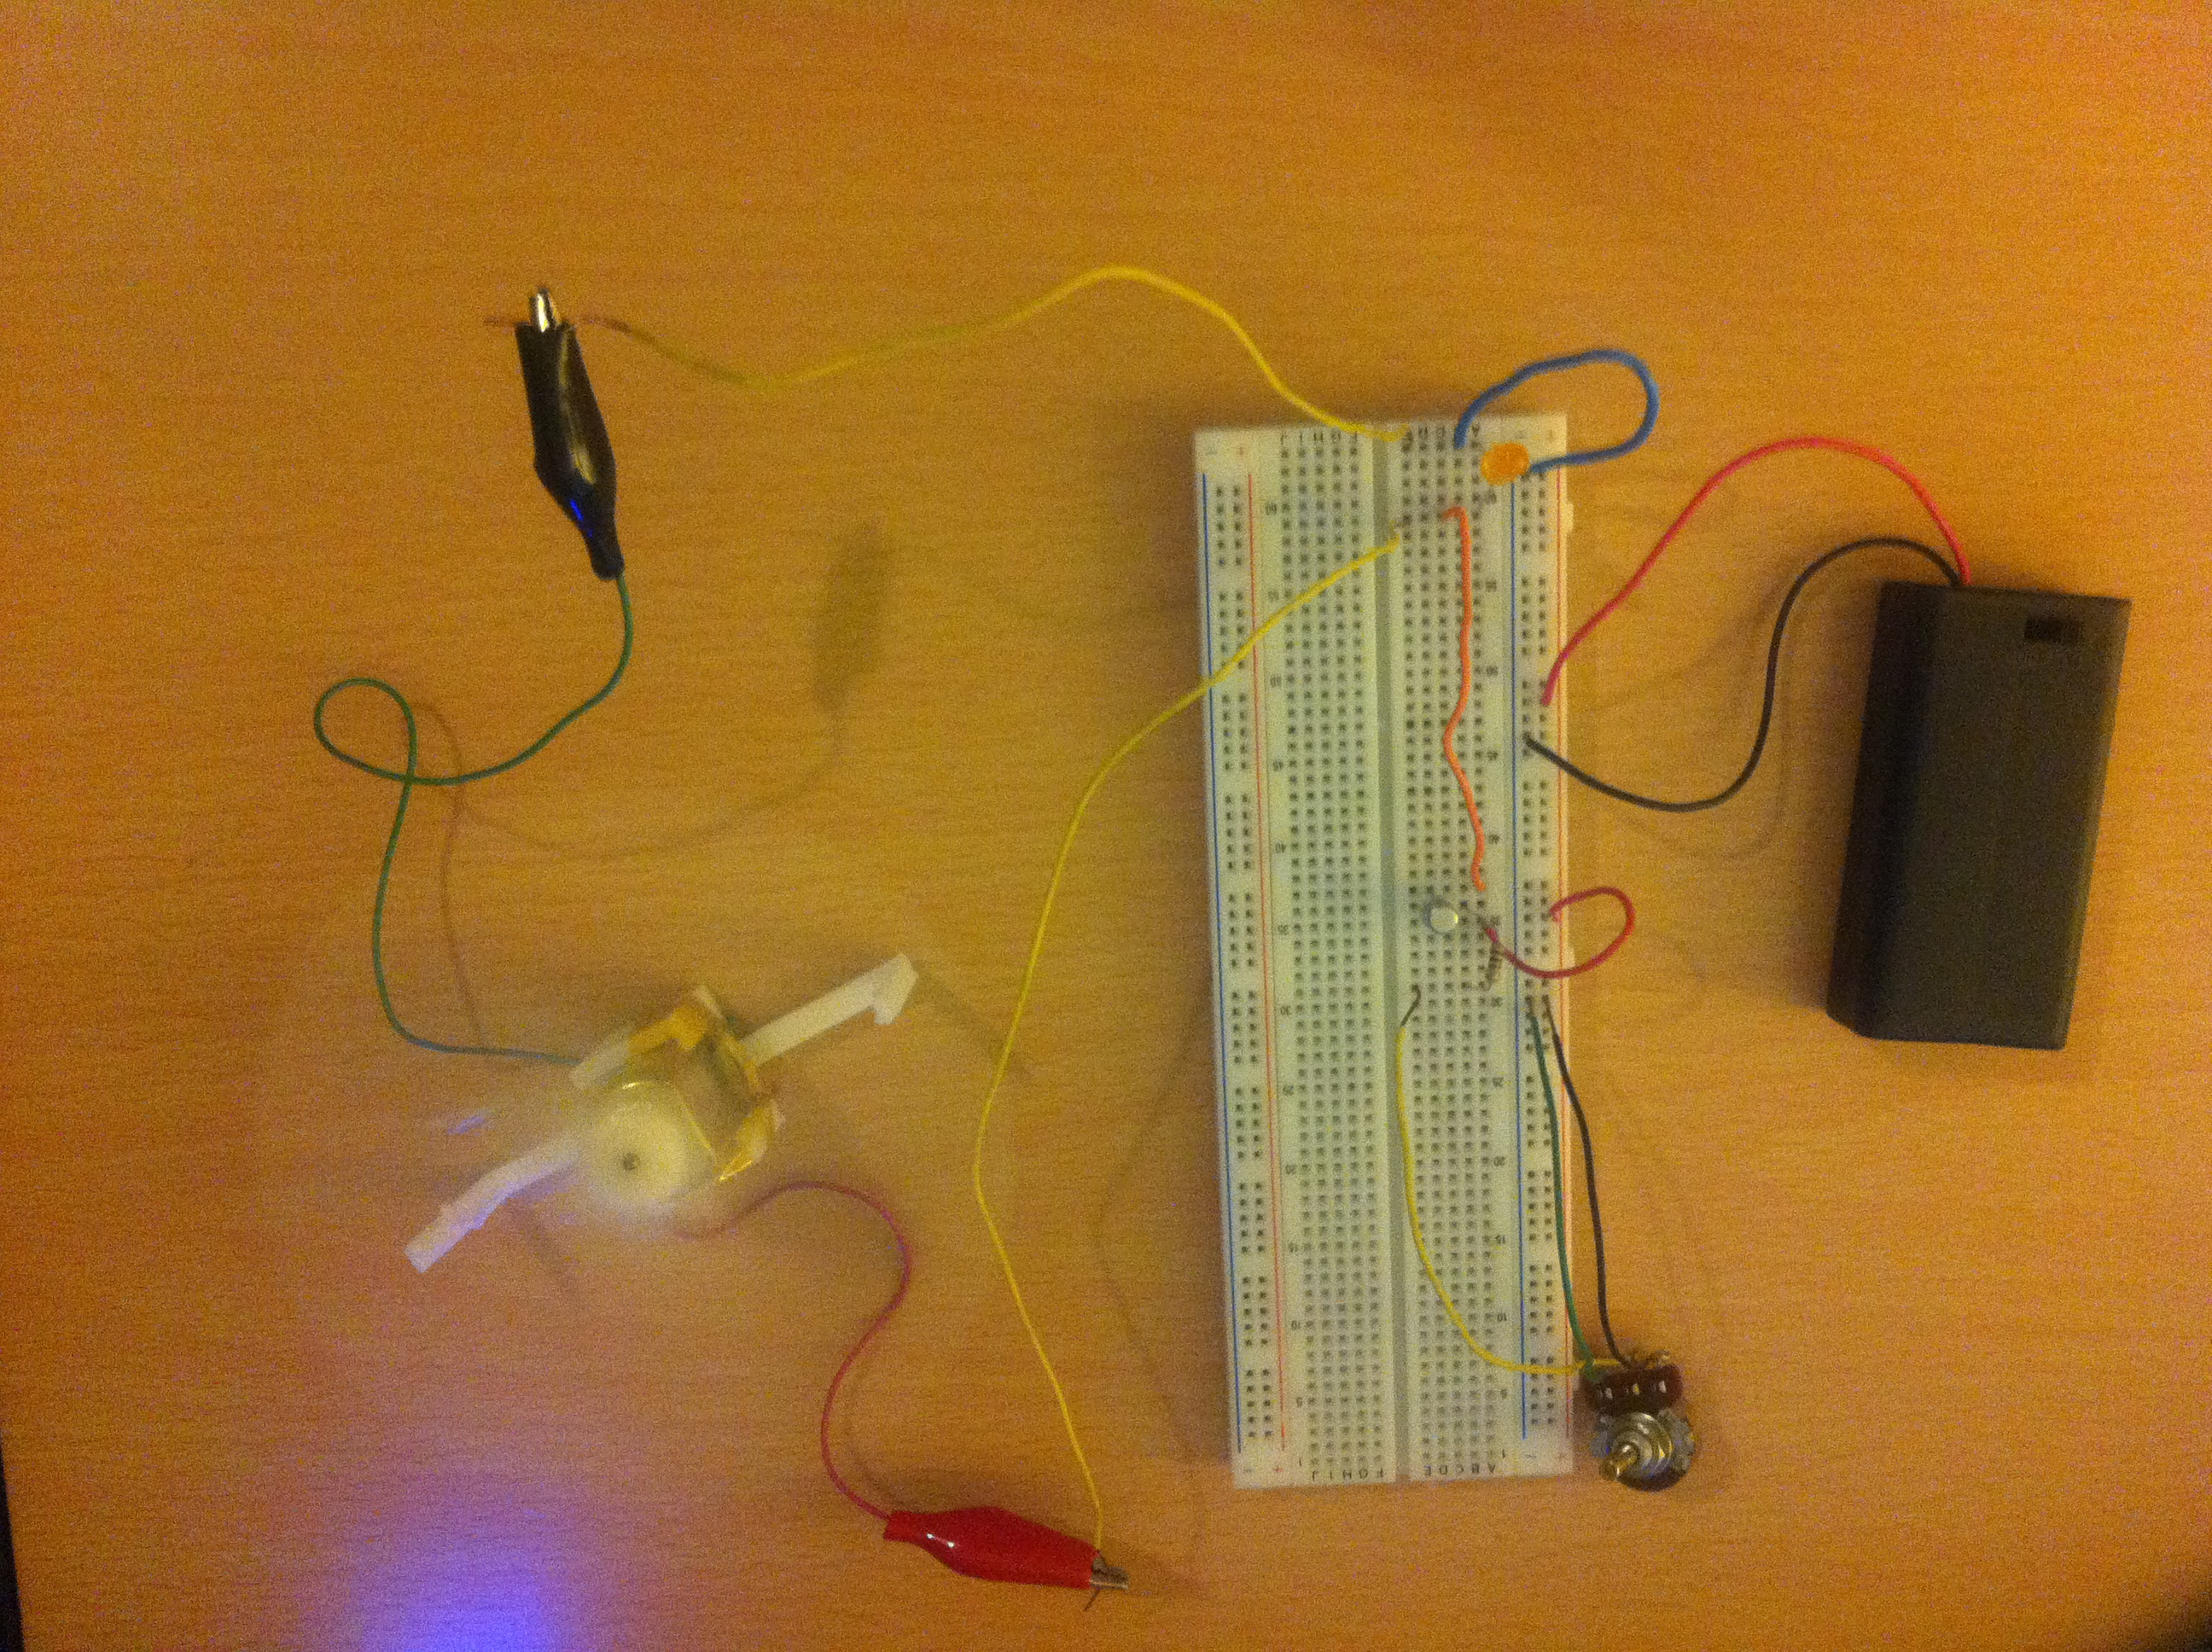 Step 5 Controlling Voltage Current Electrobotics Amplifier Circuit Motor With Led Diode Parallel Prevent Damage